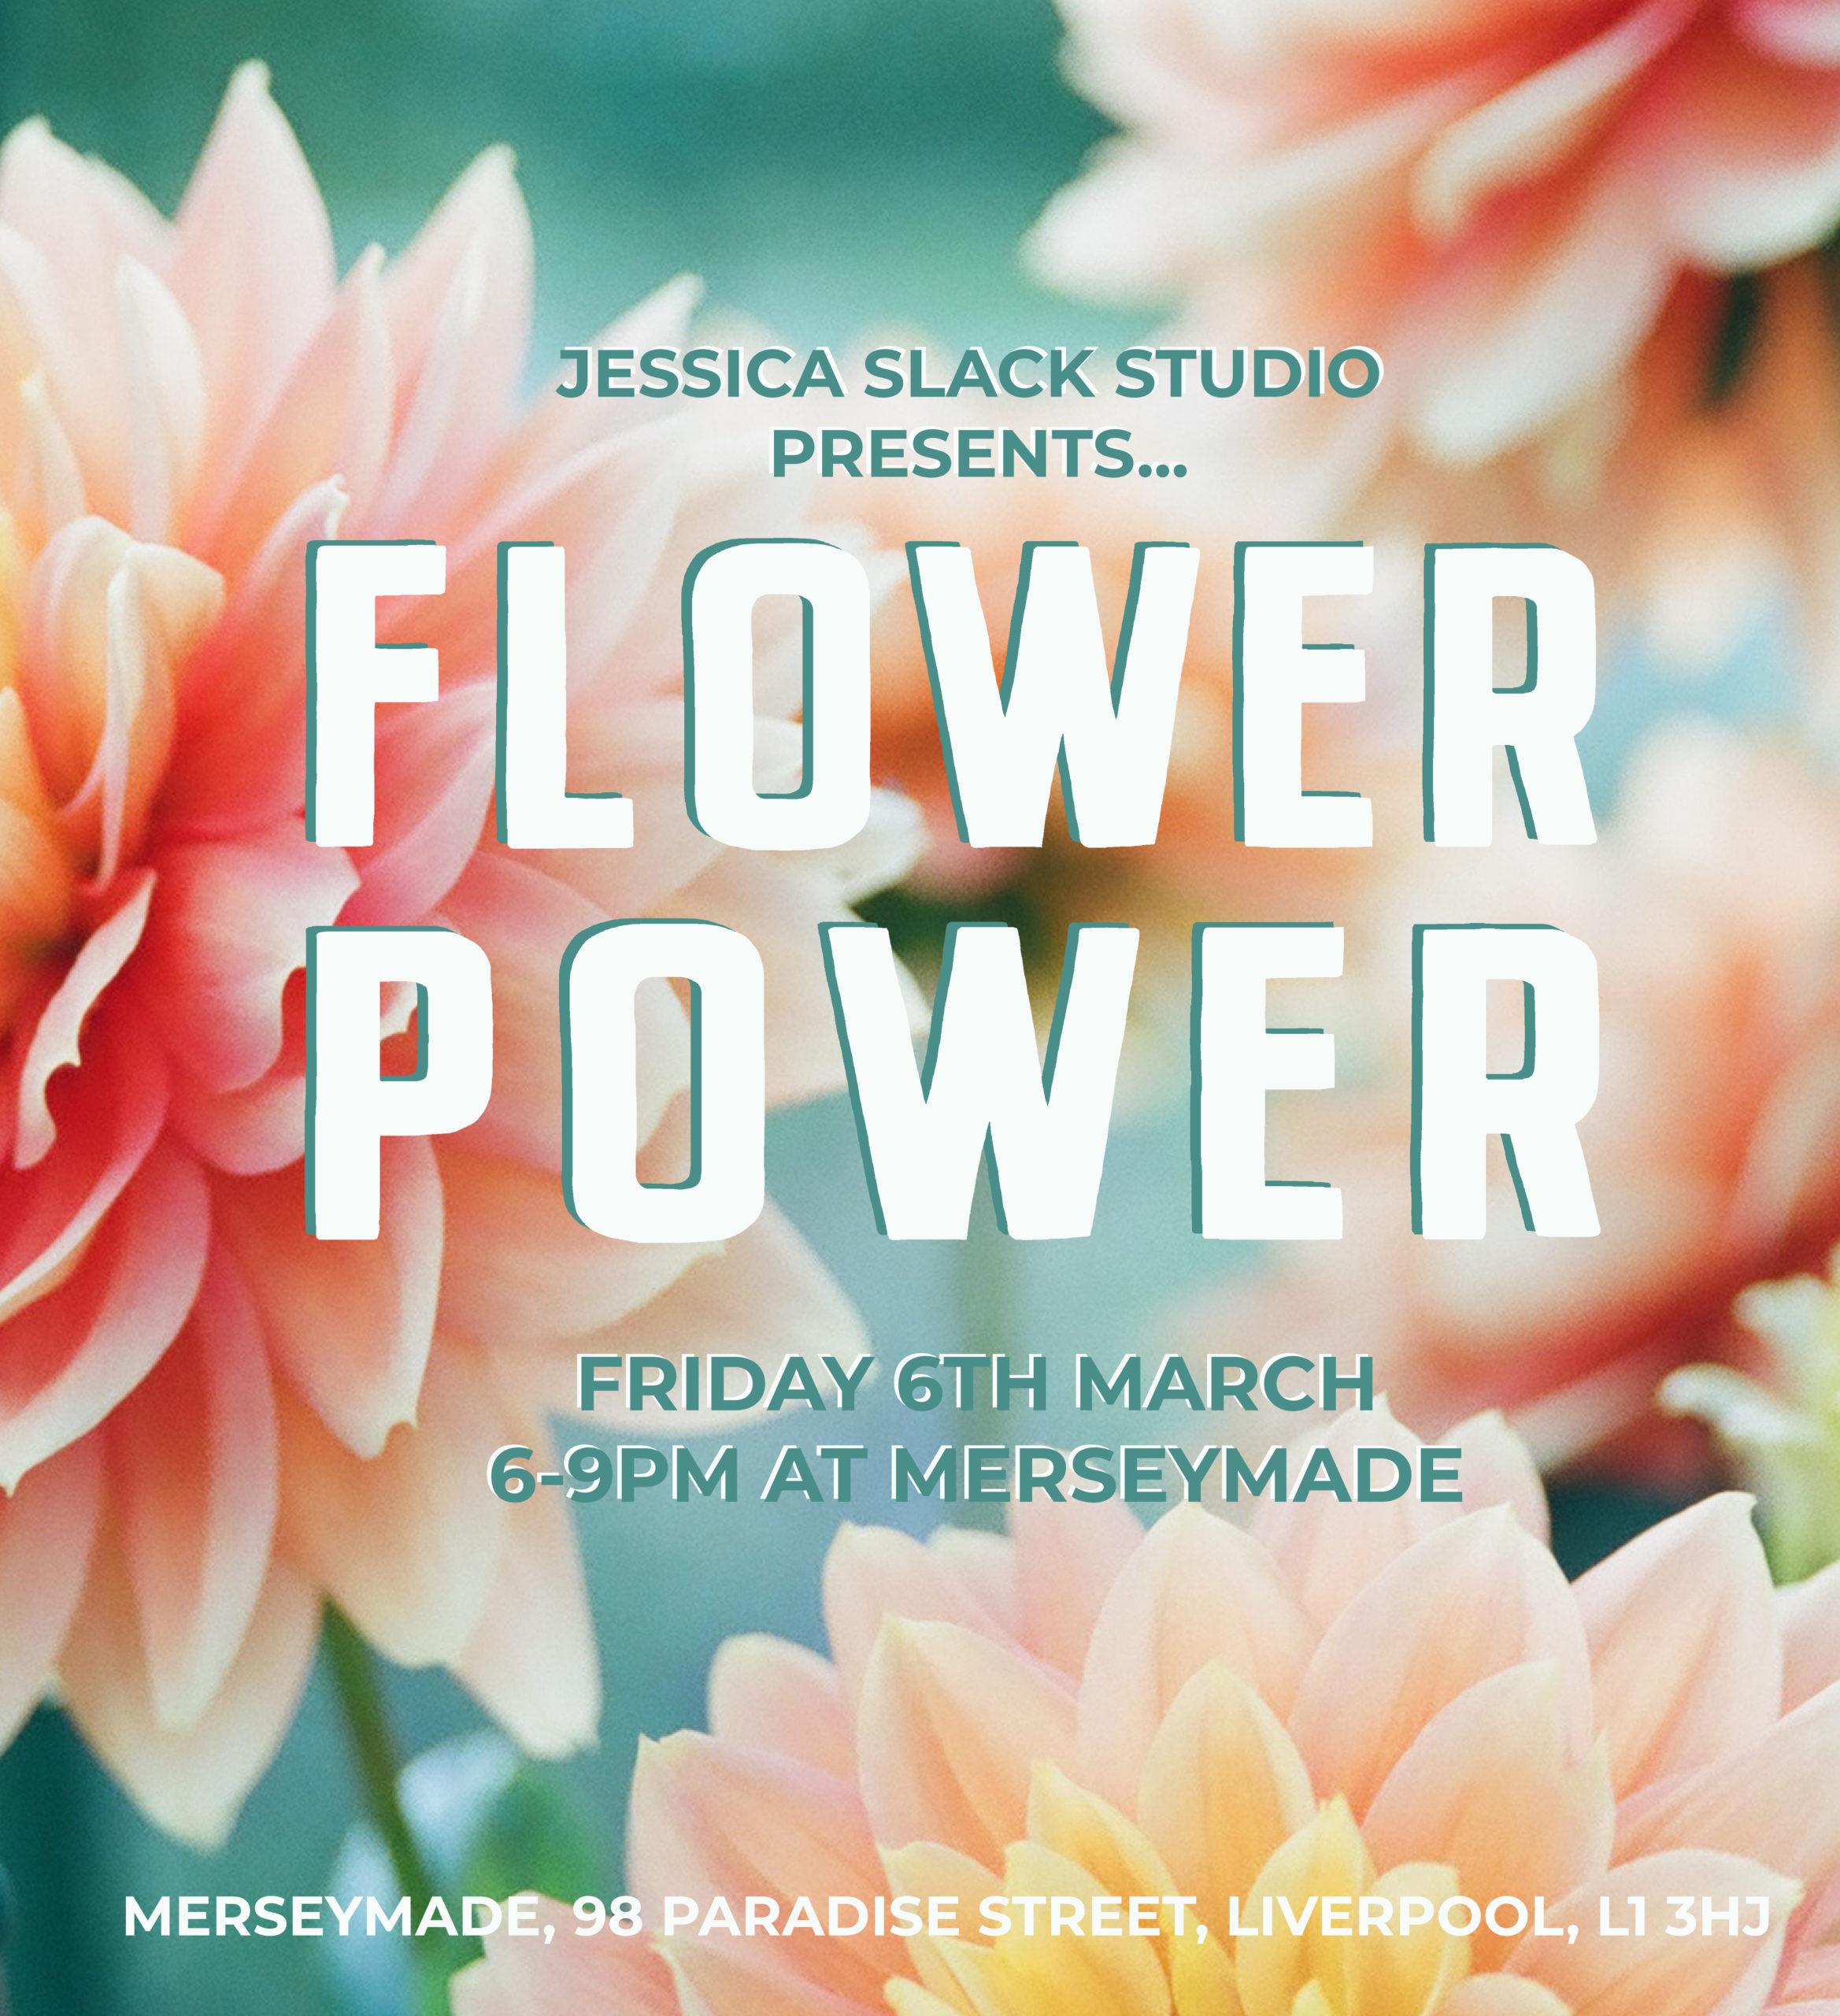 Merseymade: Jessica Slack Studio - Flower Power